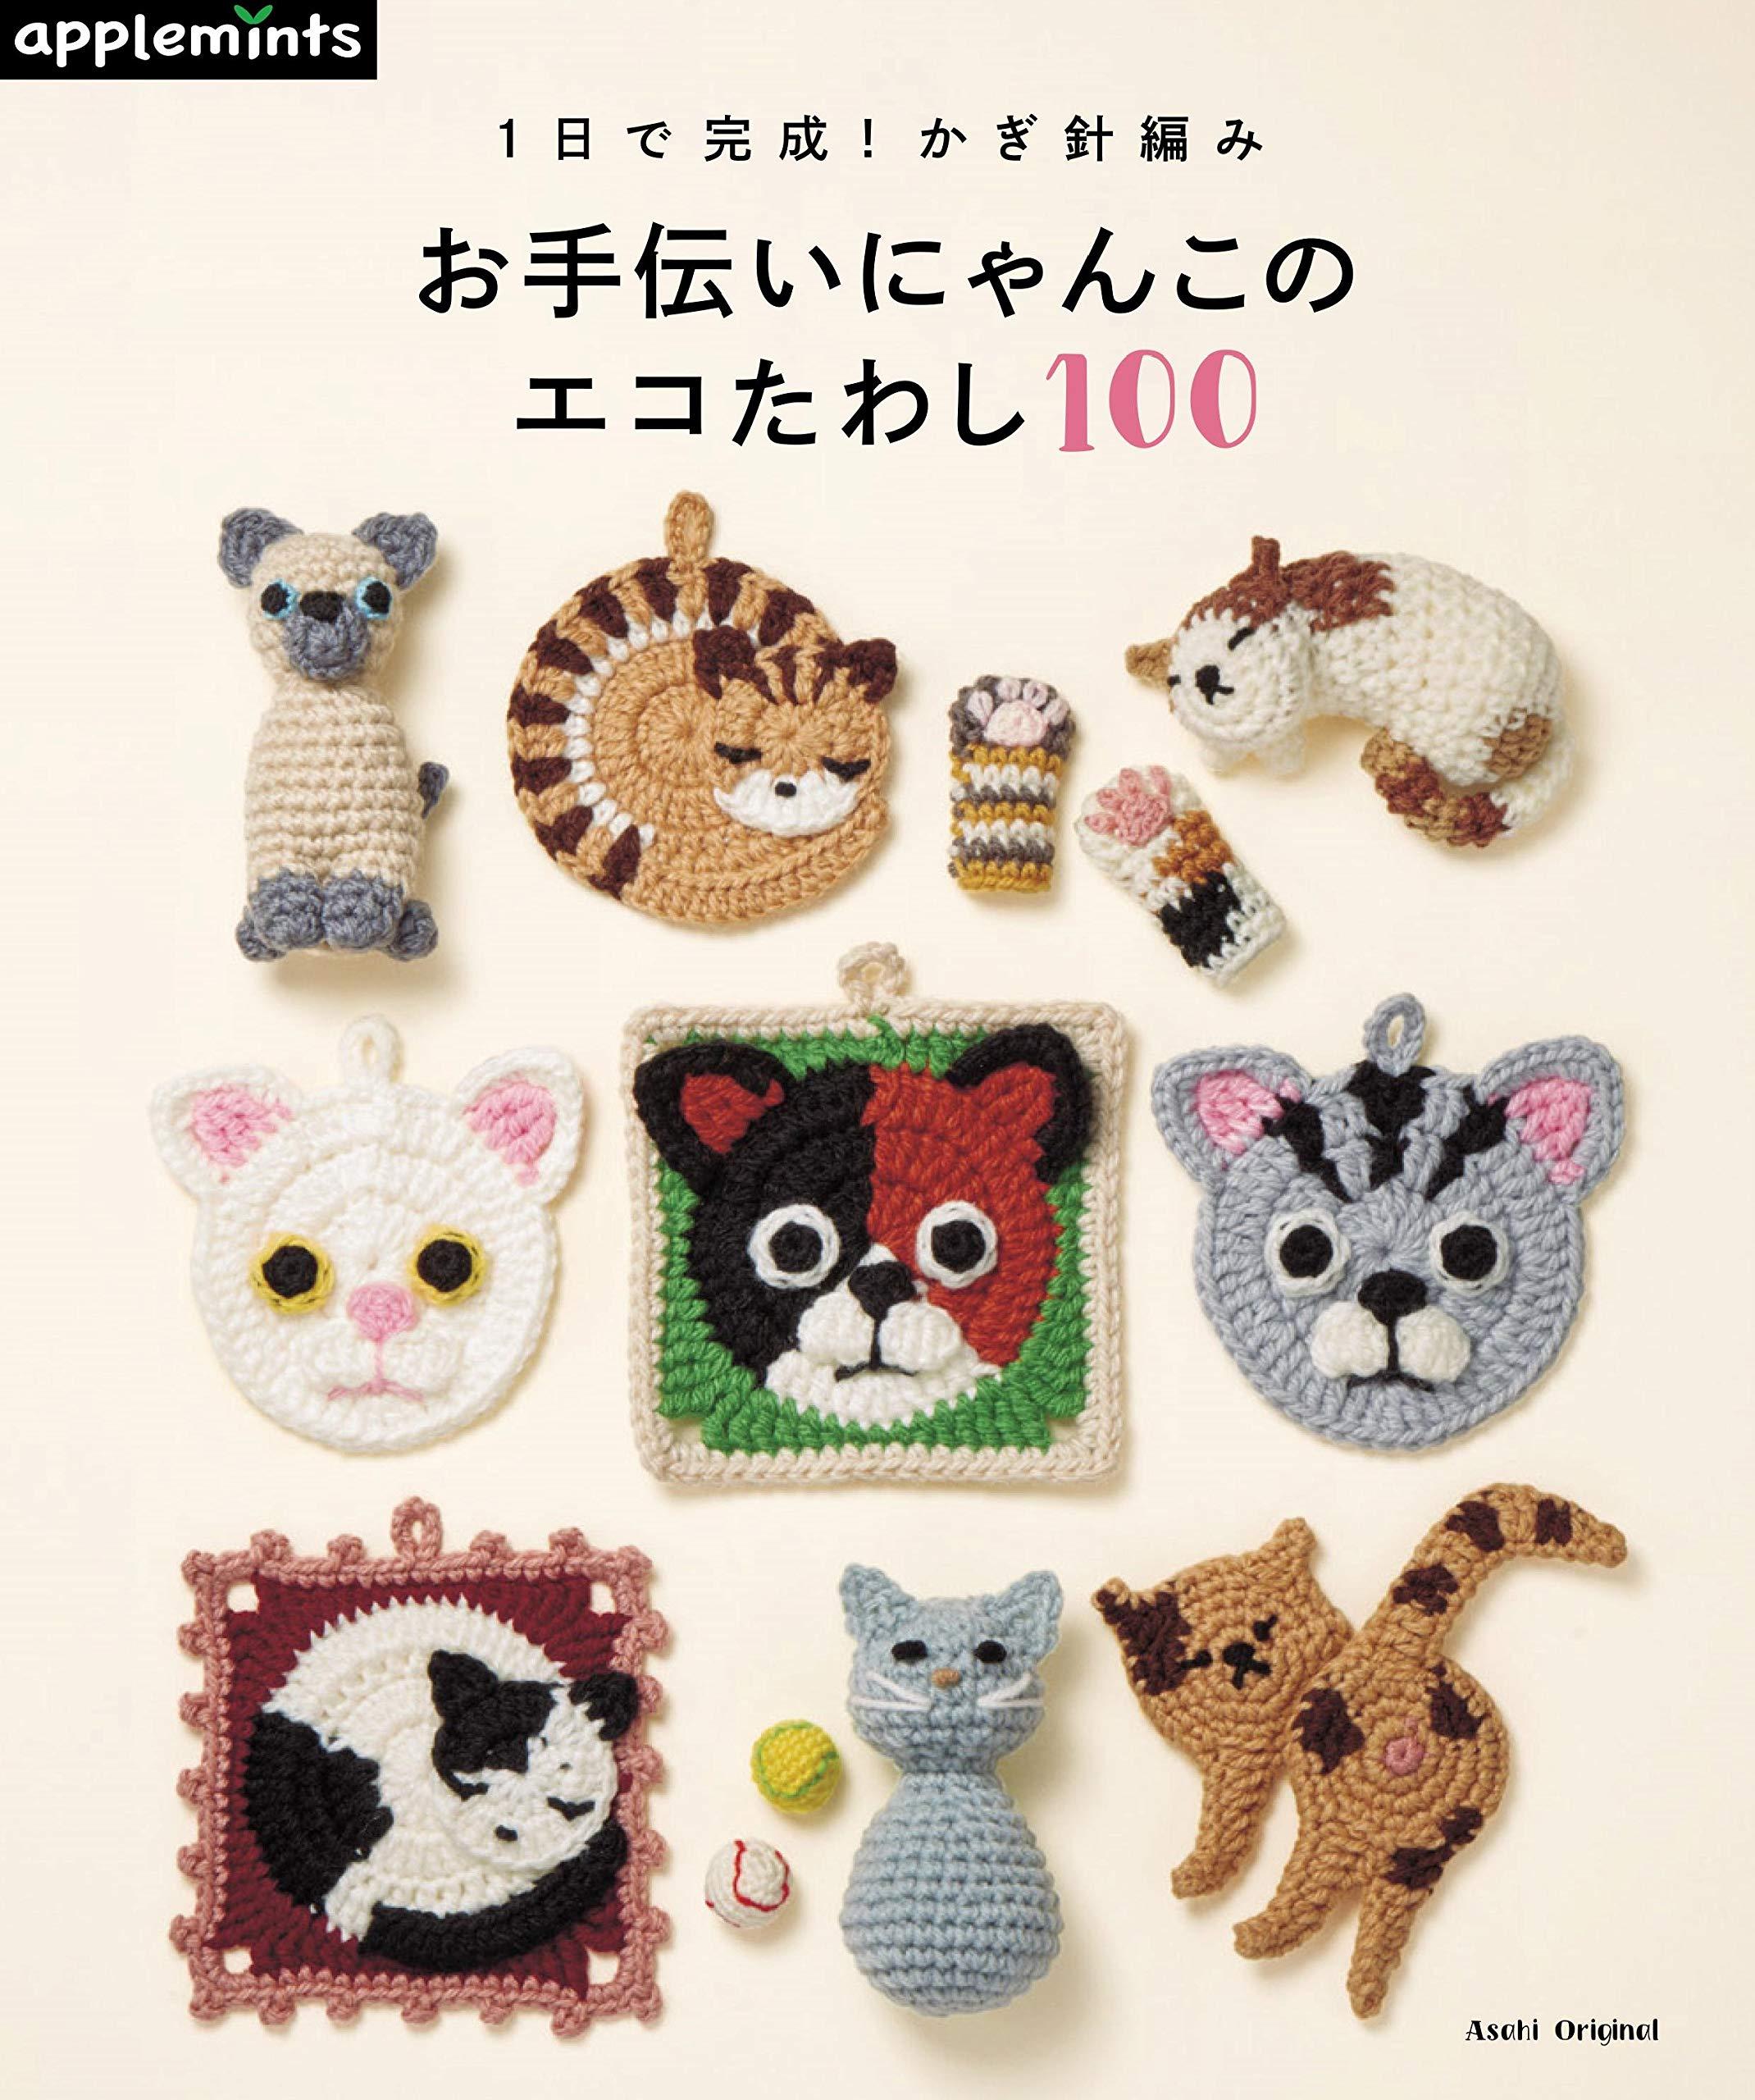 Crochet to help you Eco scrub 100